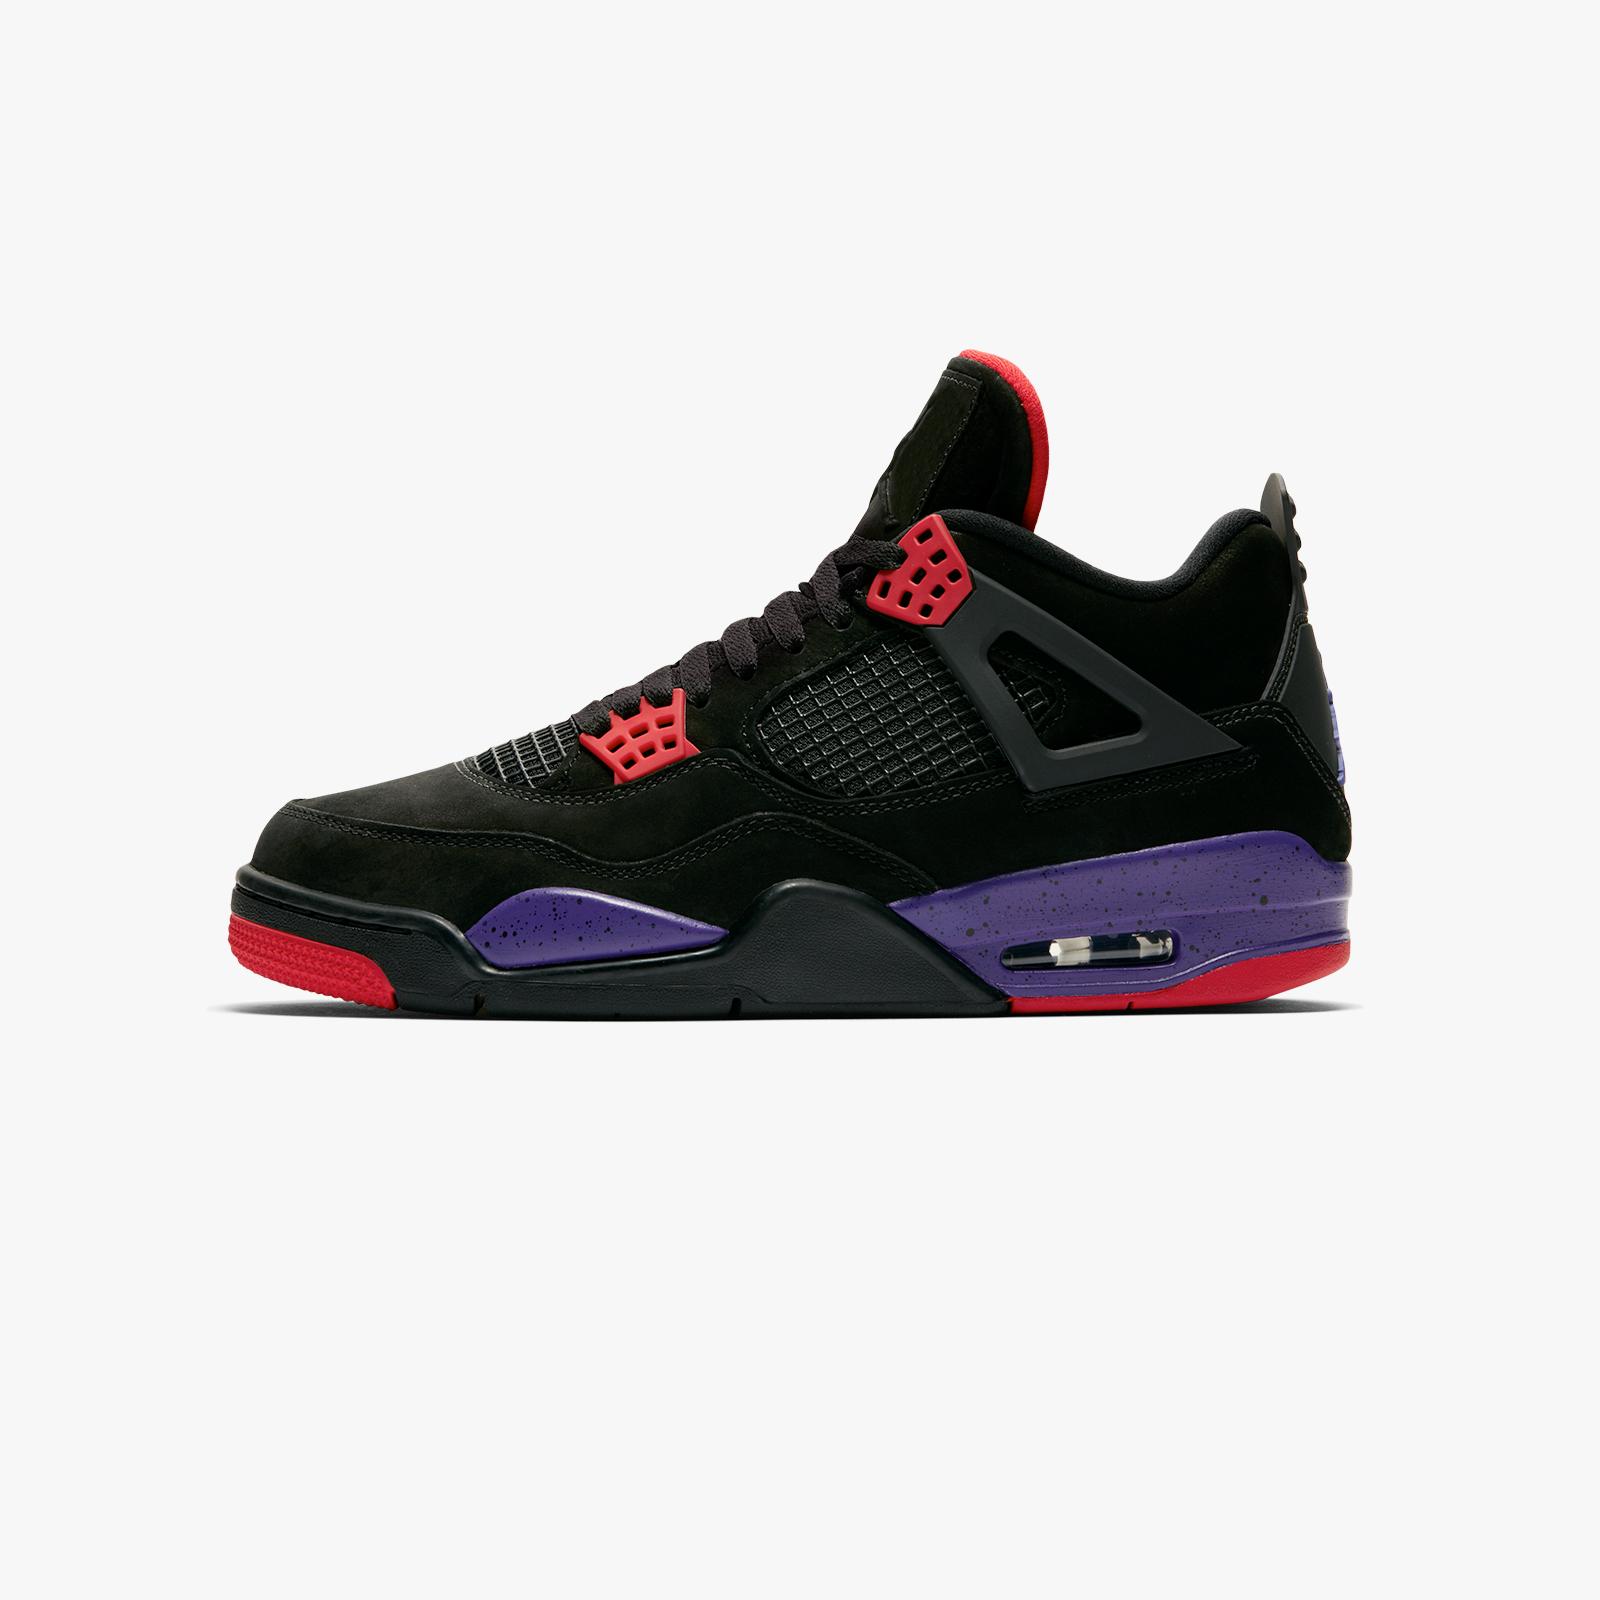 bc646d884439 Jordan Brand Air Jordan 4 Retro NRG - Aq3816-065 - Sneakersnstuff ...